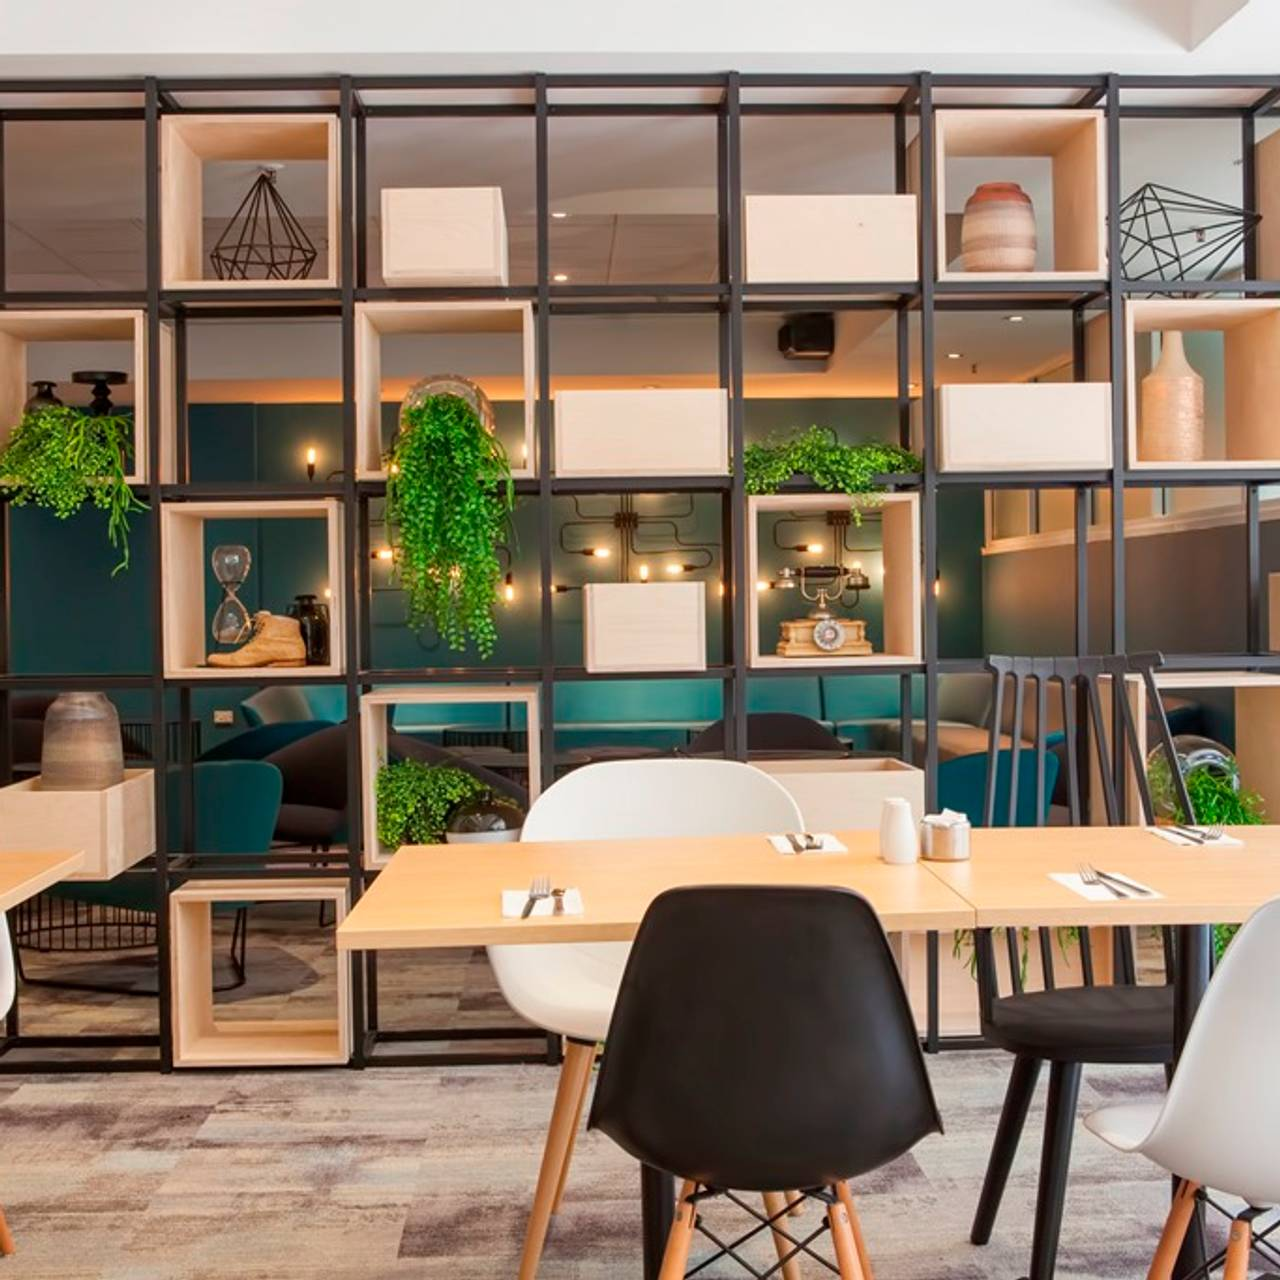 Gumtree restaurant bar metro aspire hotel sydney ultimo au nsw opentable